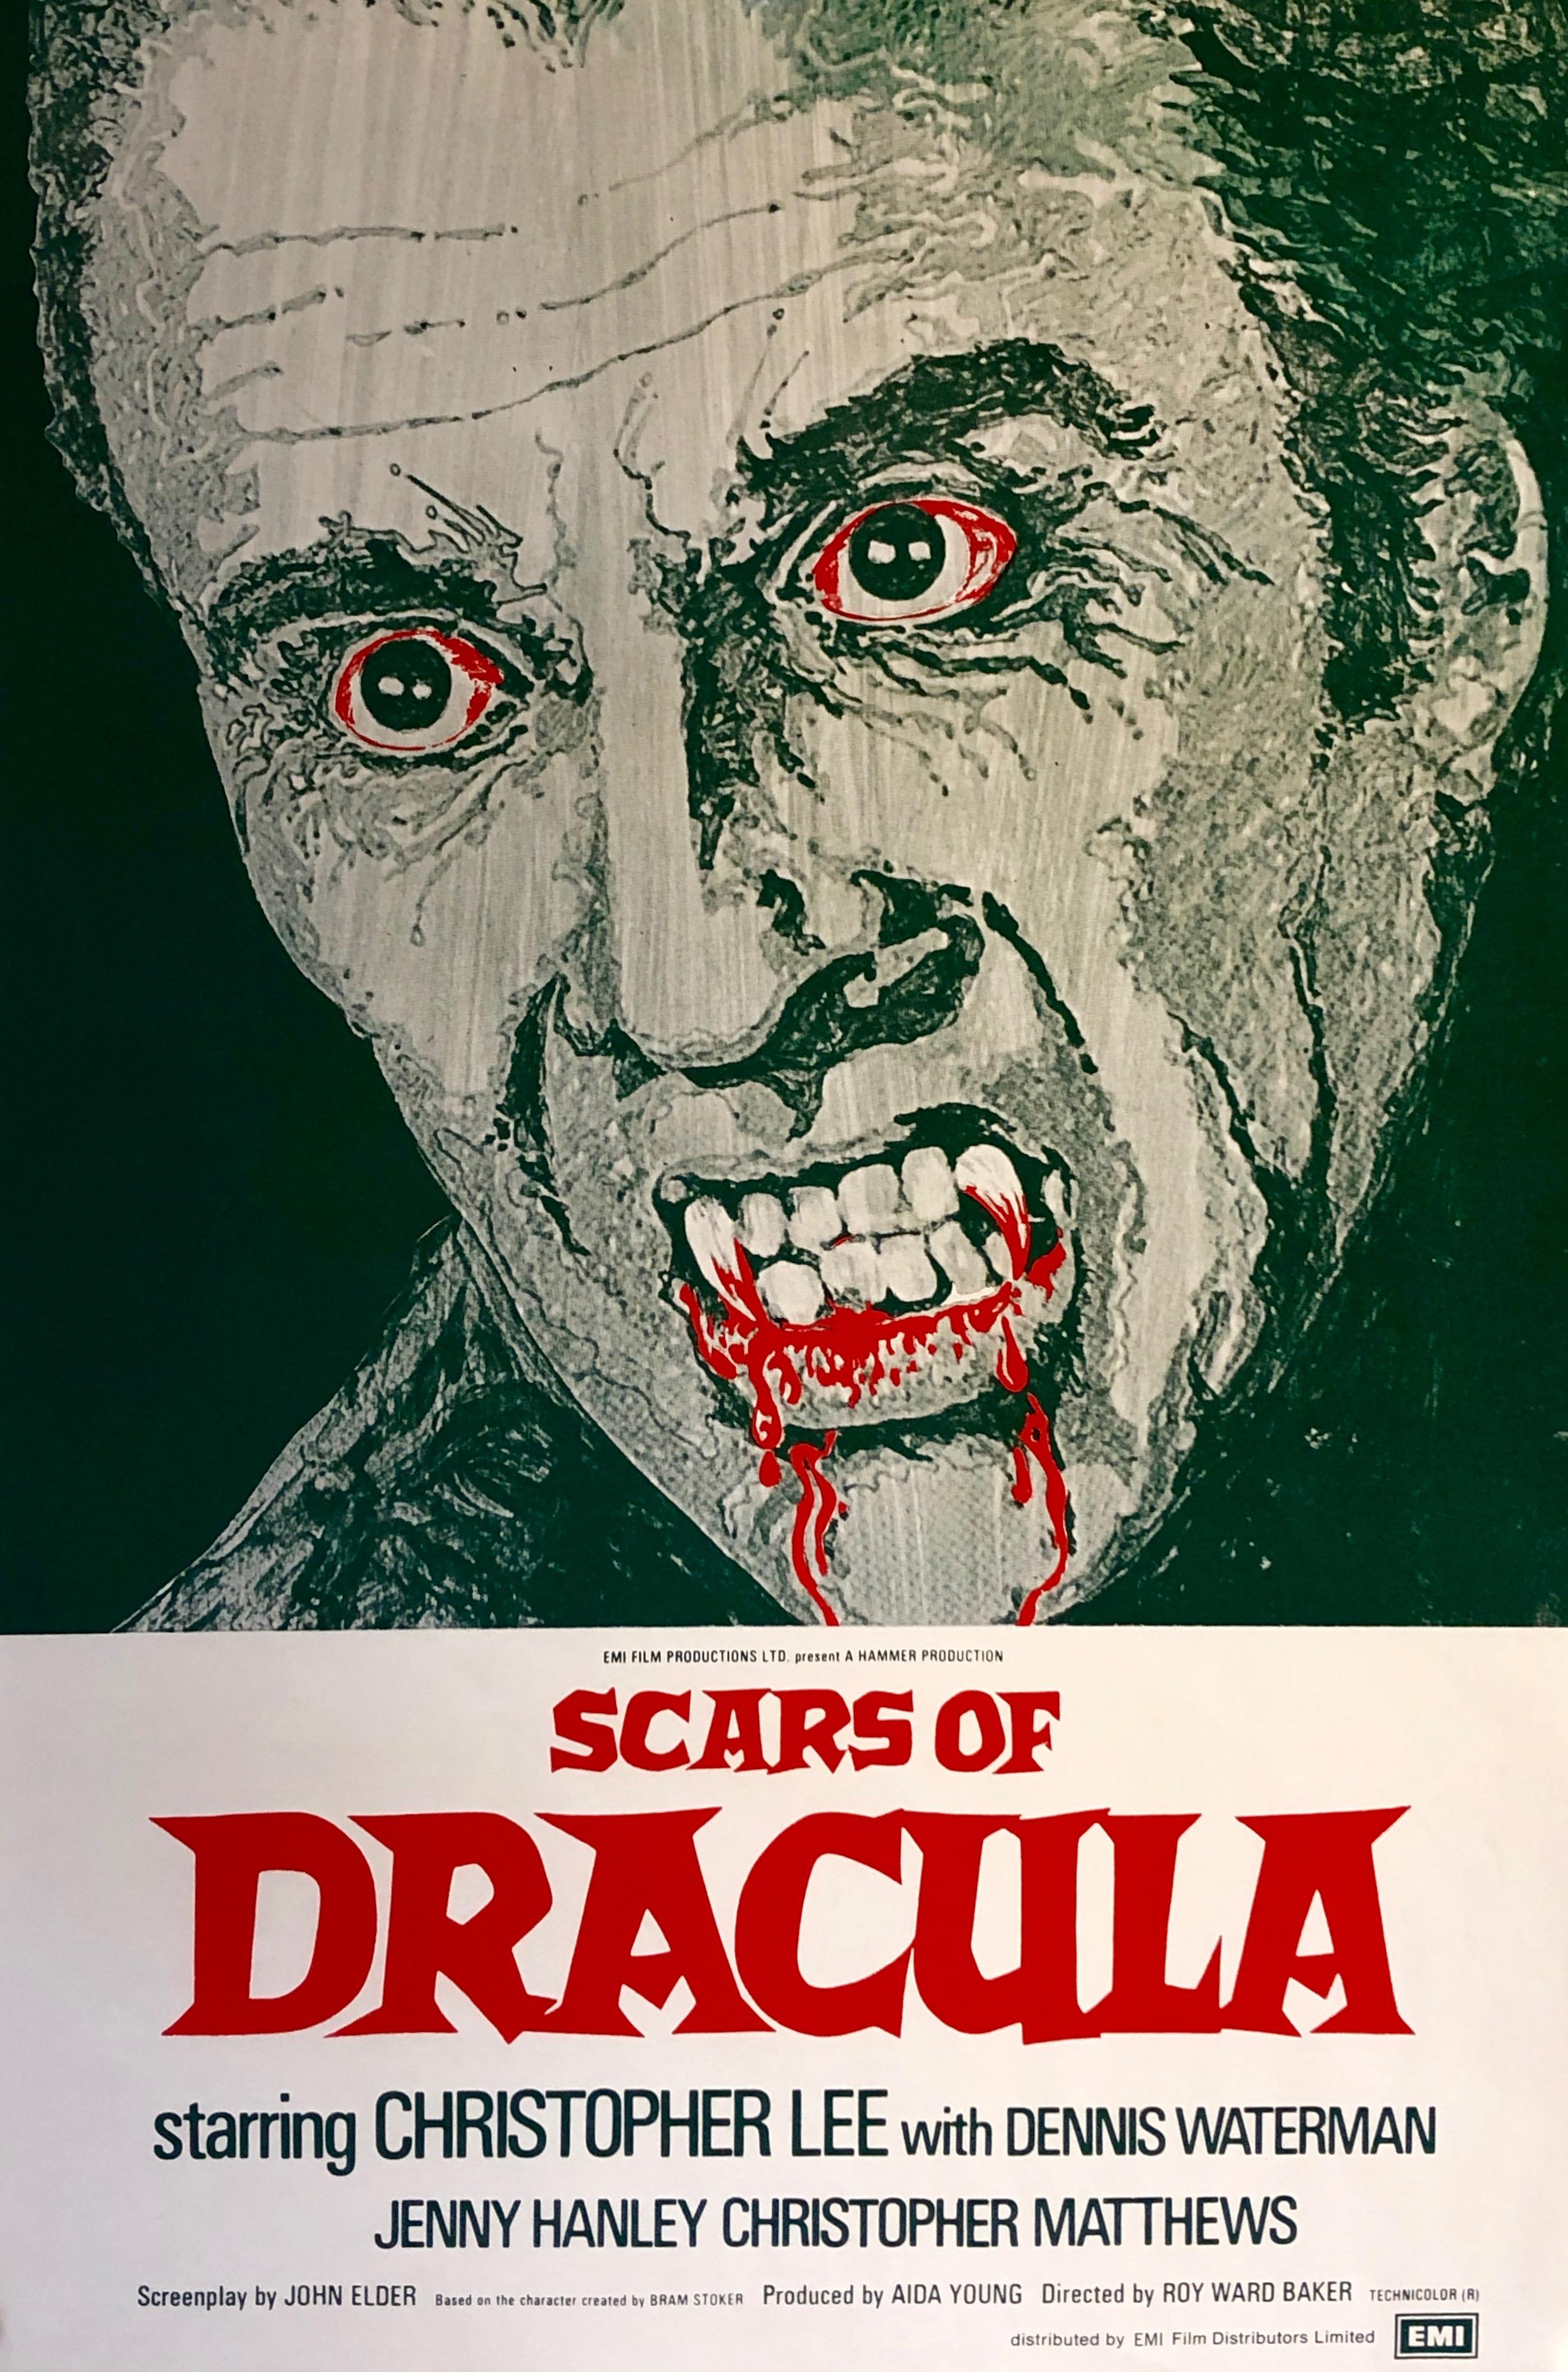 Original Scars of Dracula Movie Poster - Hammer - Christopher Lee